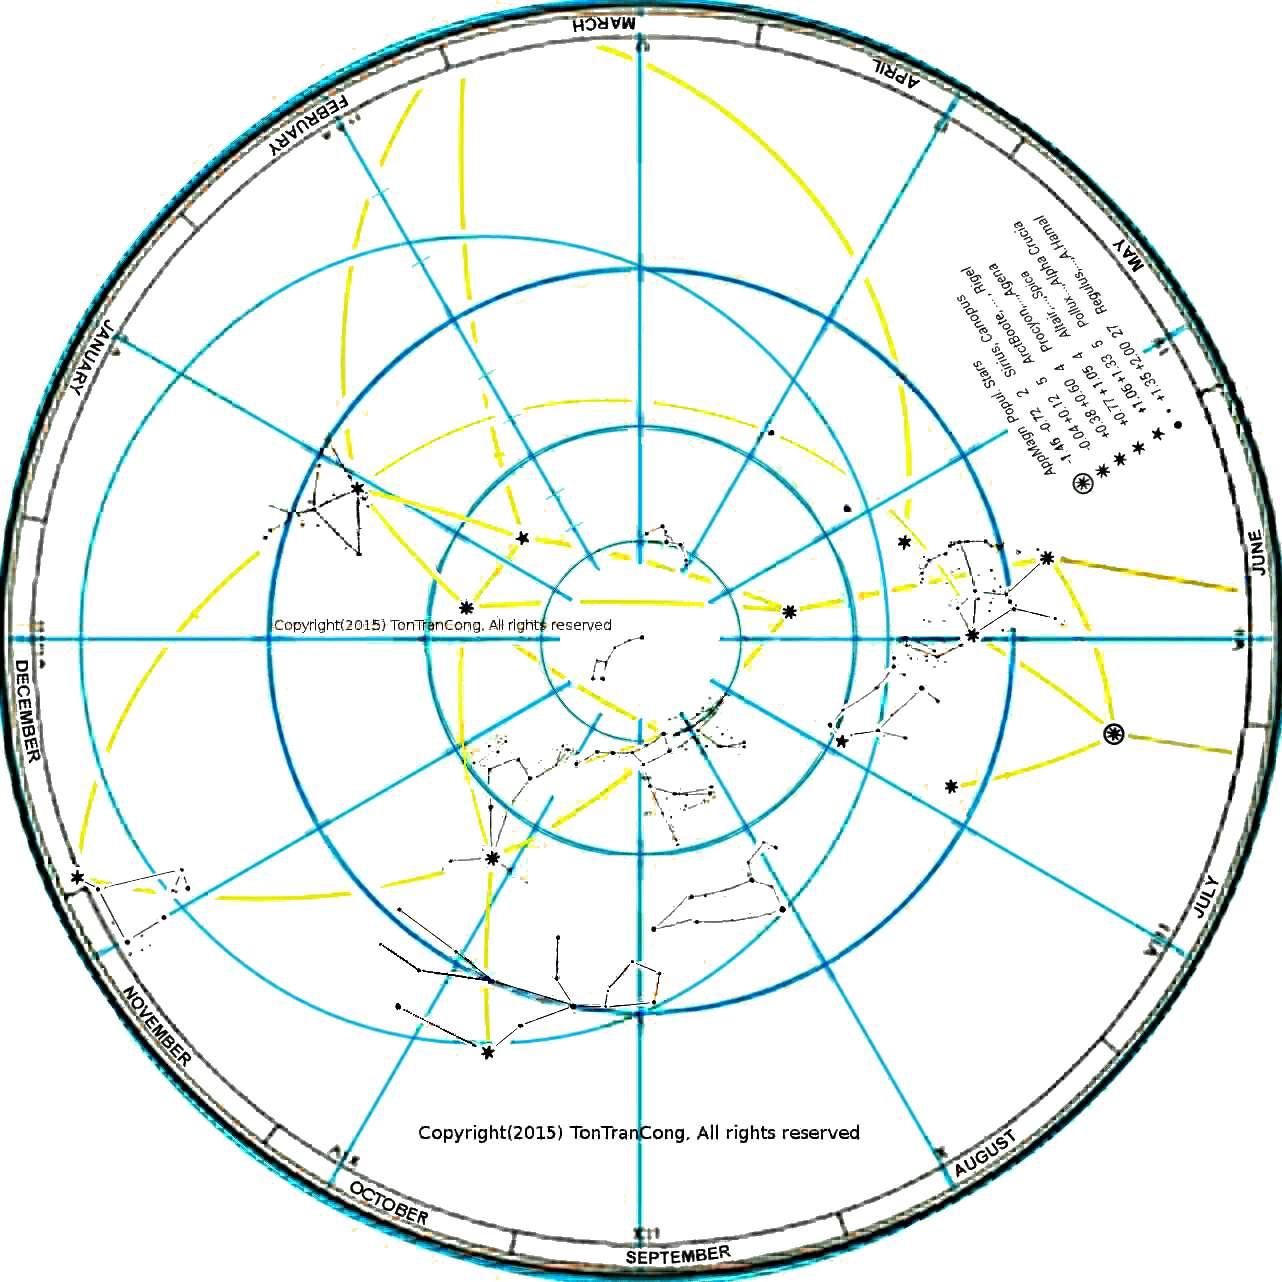 Sky-disk for Celestial Northern 3/4-sphere